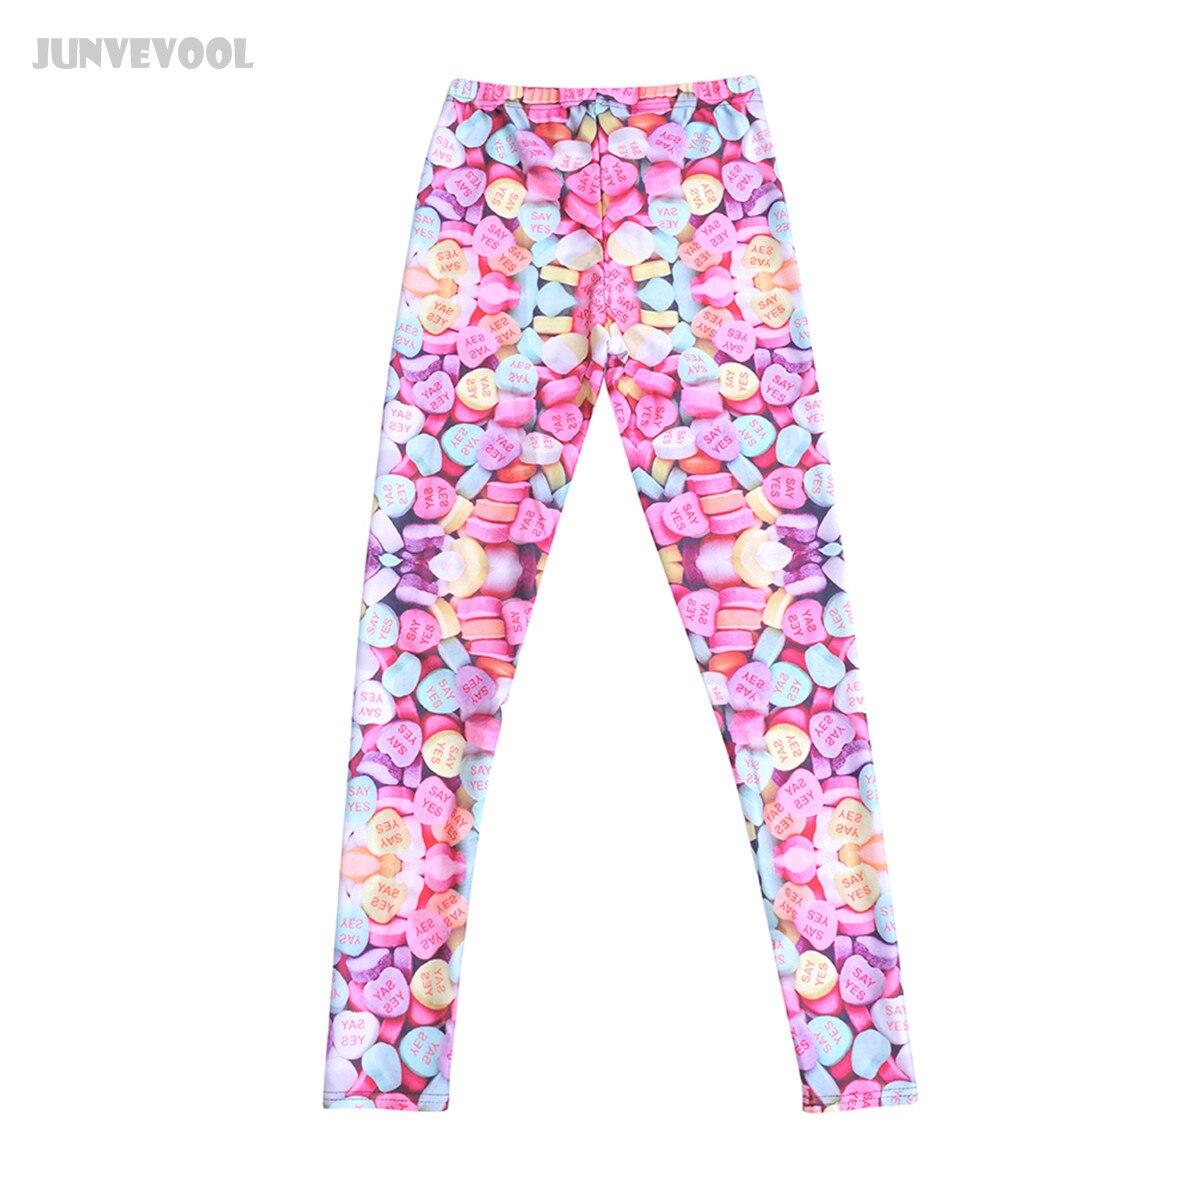 Aliexpress.com : Buy Fitness Leggings Fashion Women Trousers ...